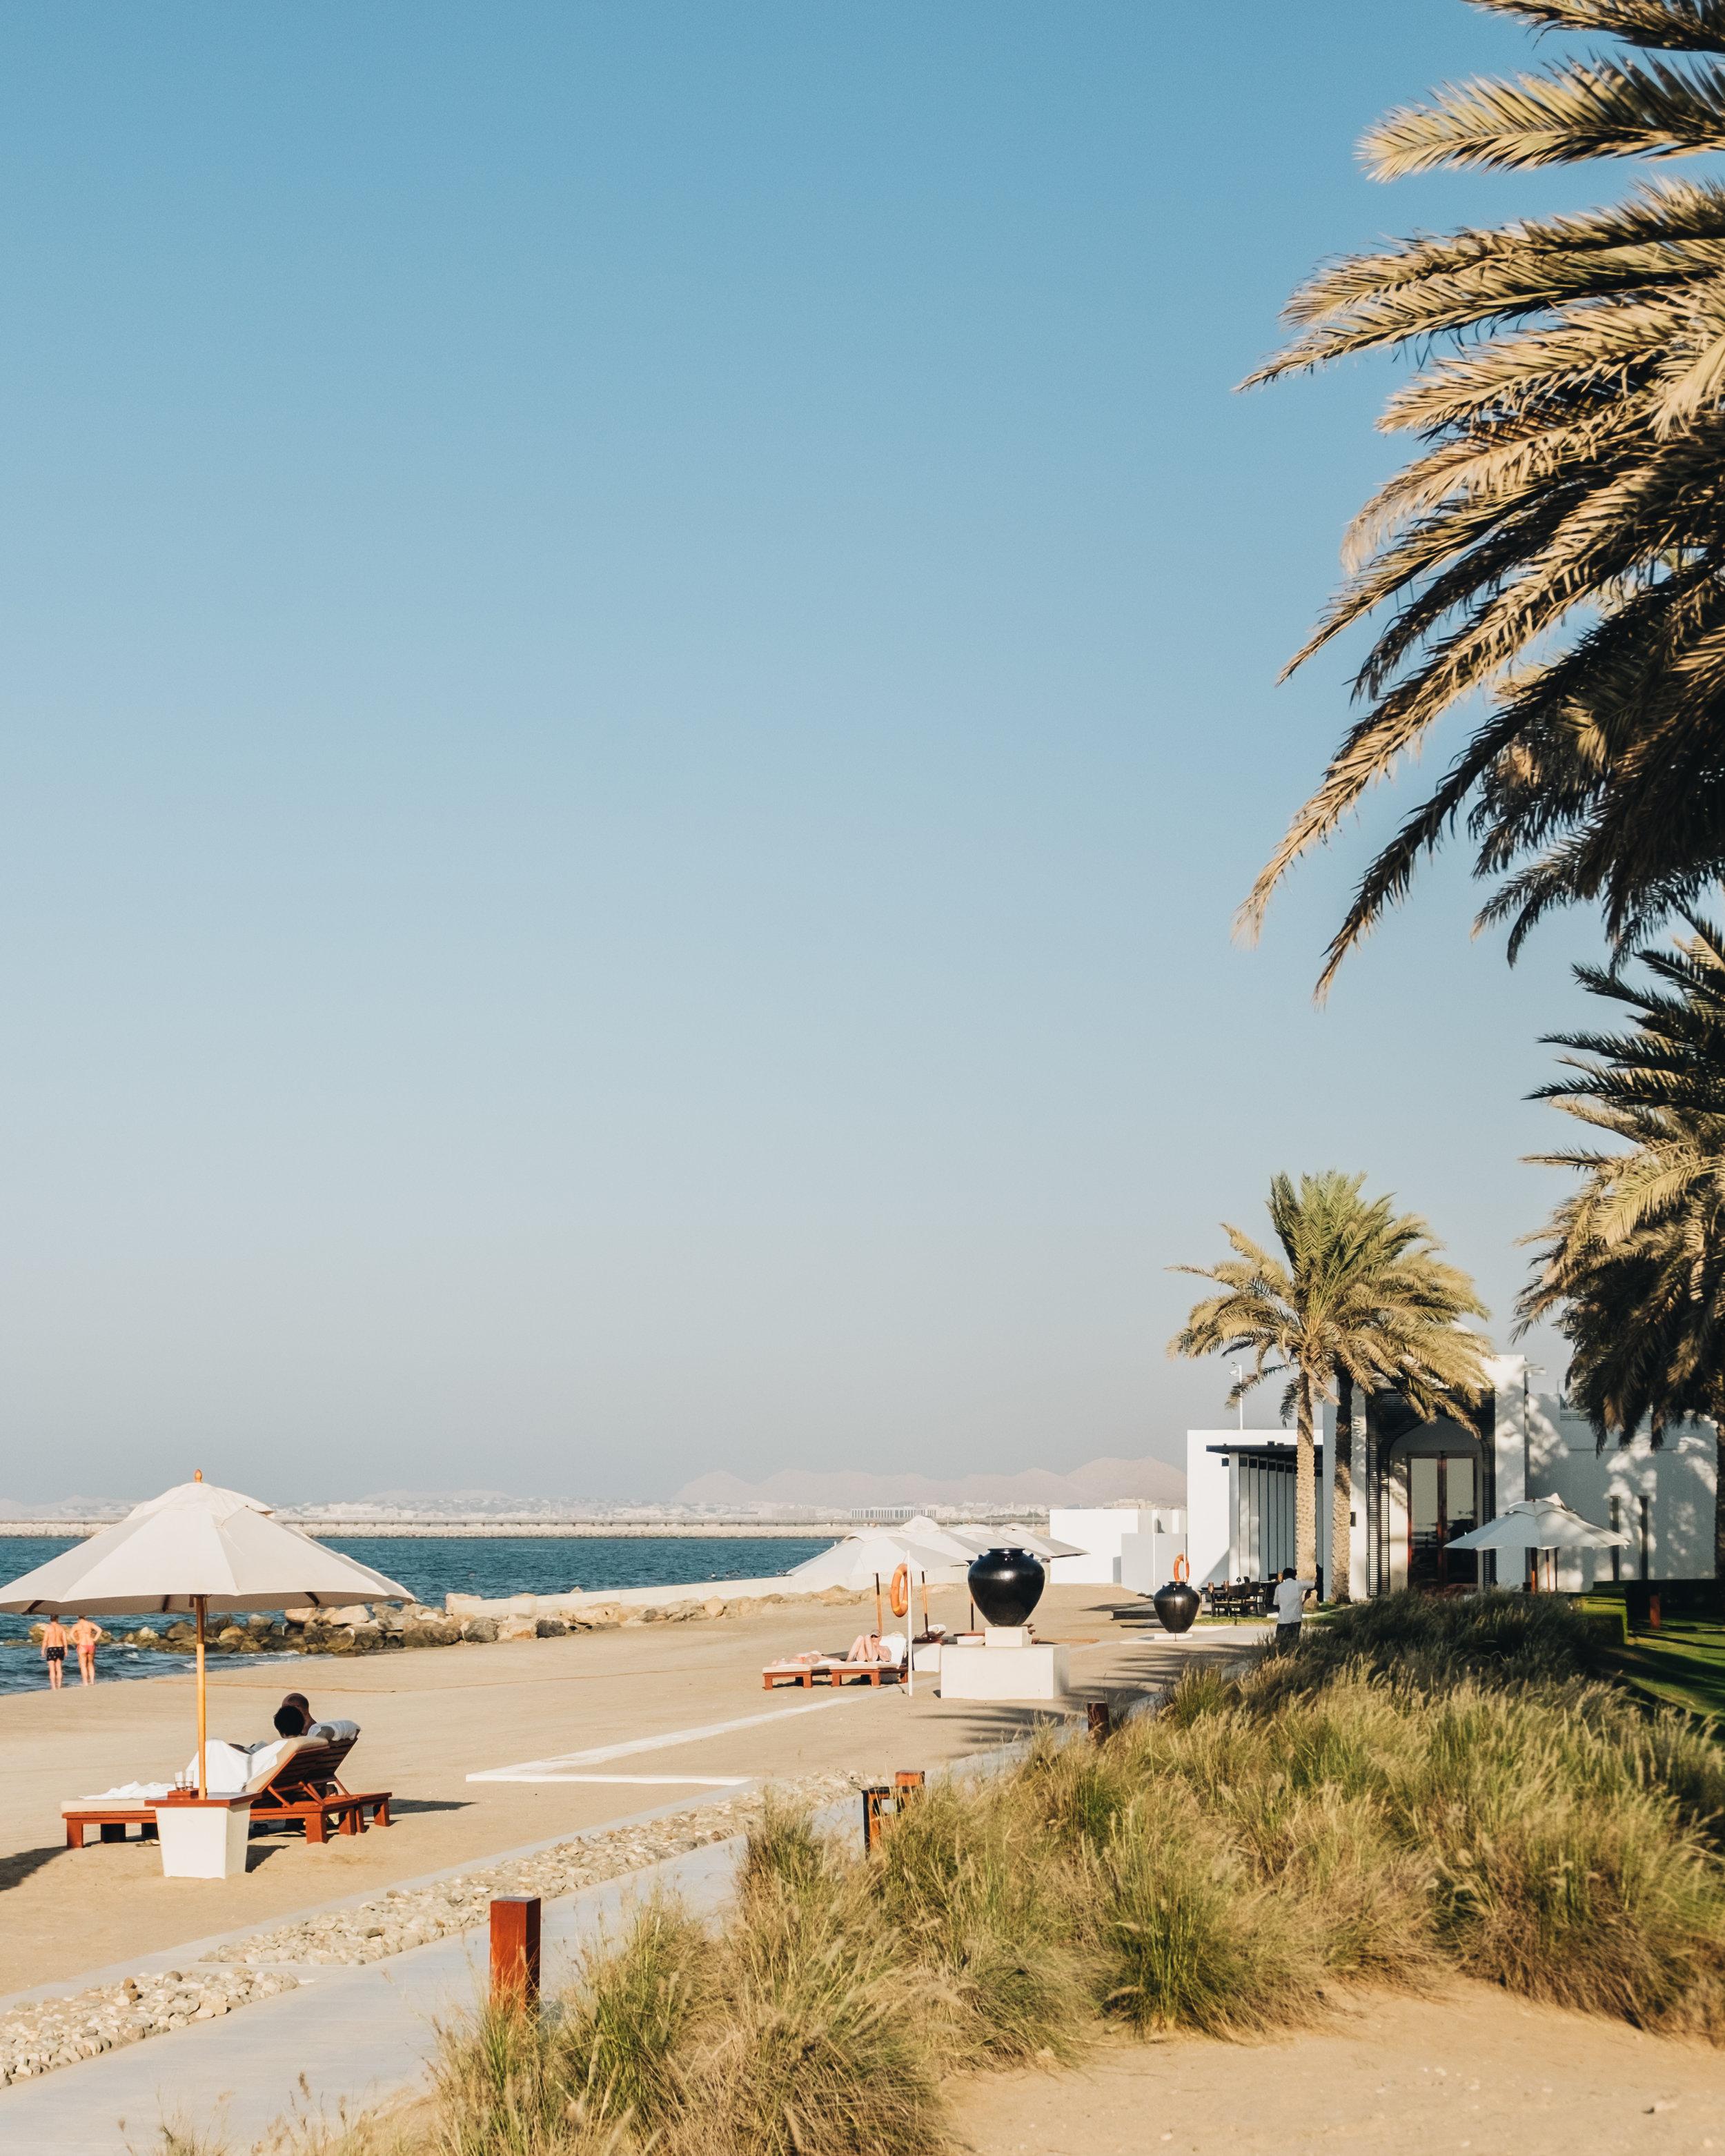 Oman-5889.jpg